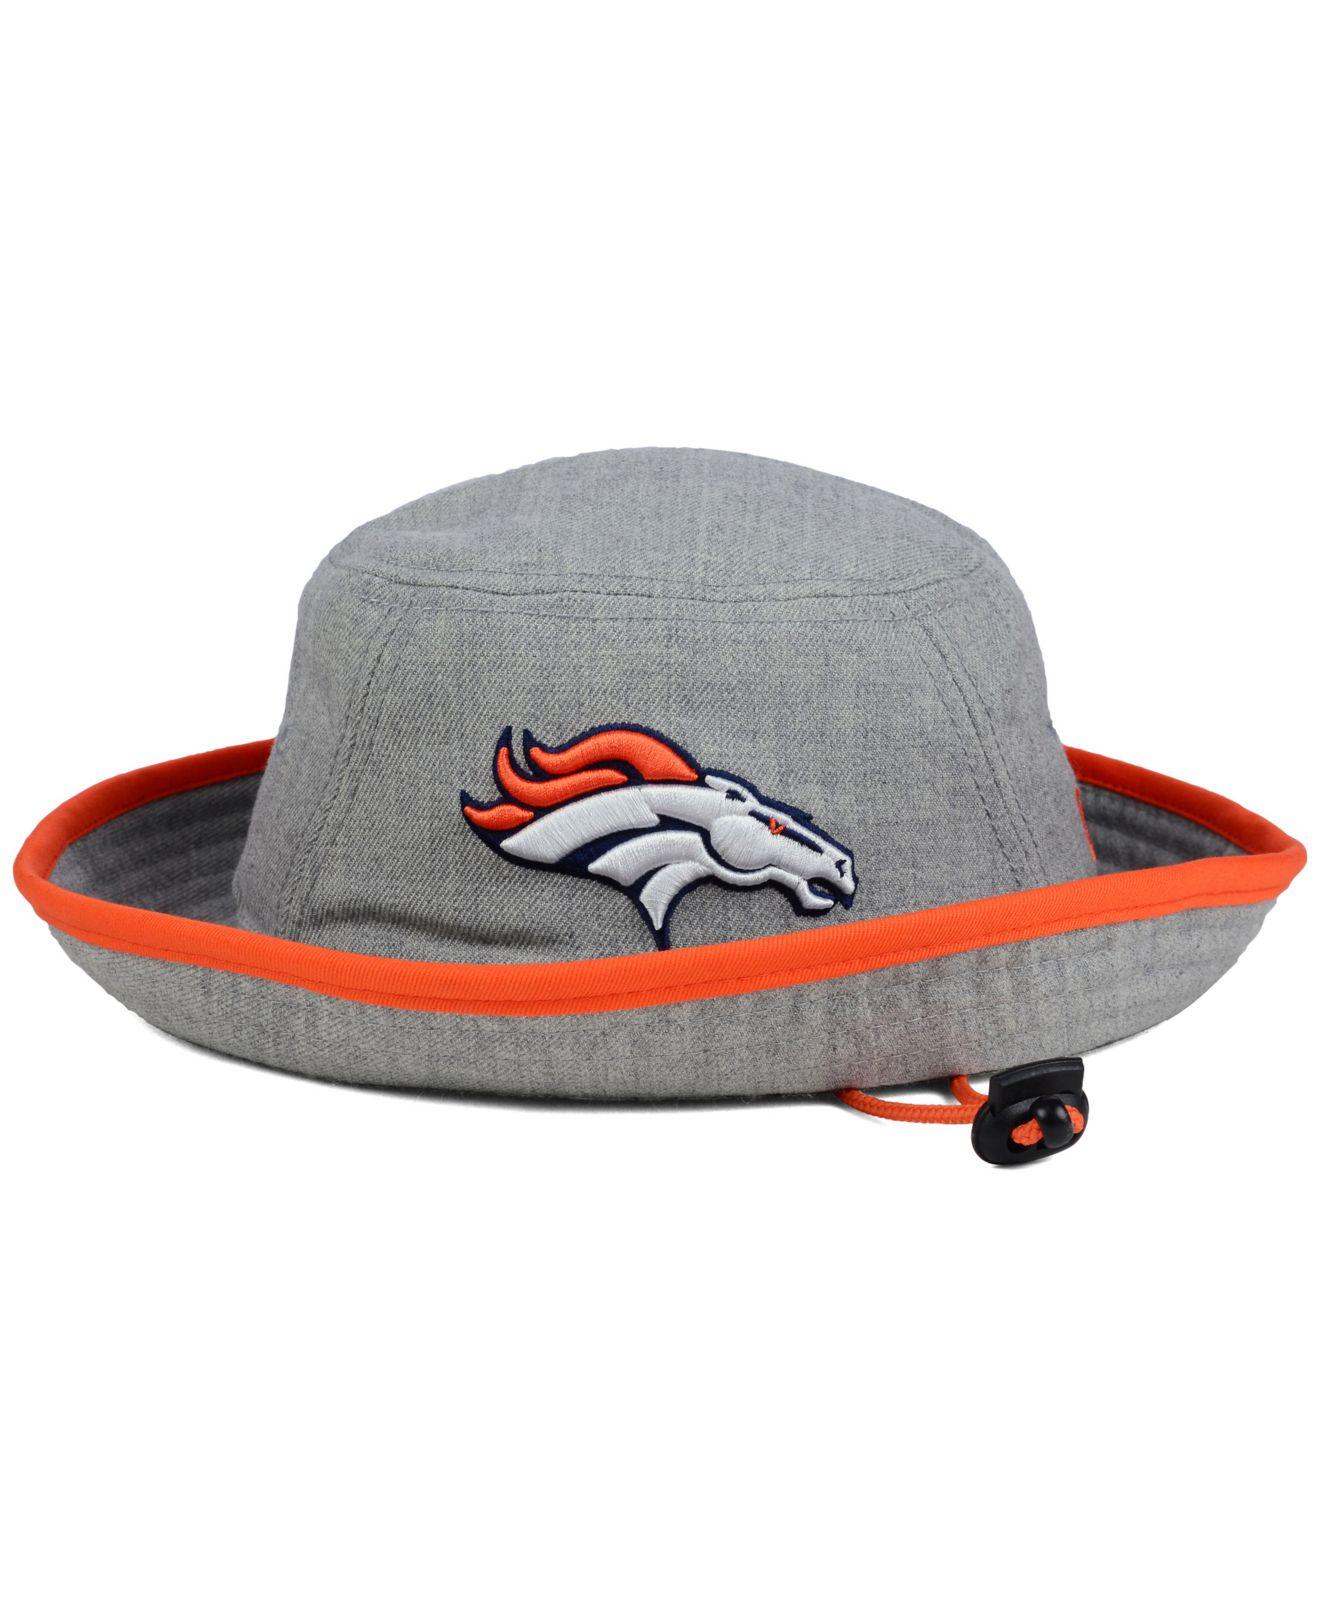 meet 97a3f 34eff ... orange new era footb 501ad 5ba19  italy coupon for lyst ktz denver  broncos nfl heather gray bucket hat in gray for men